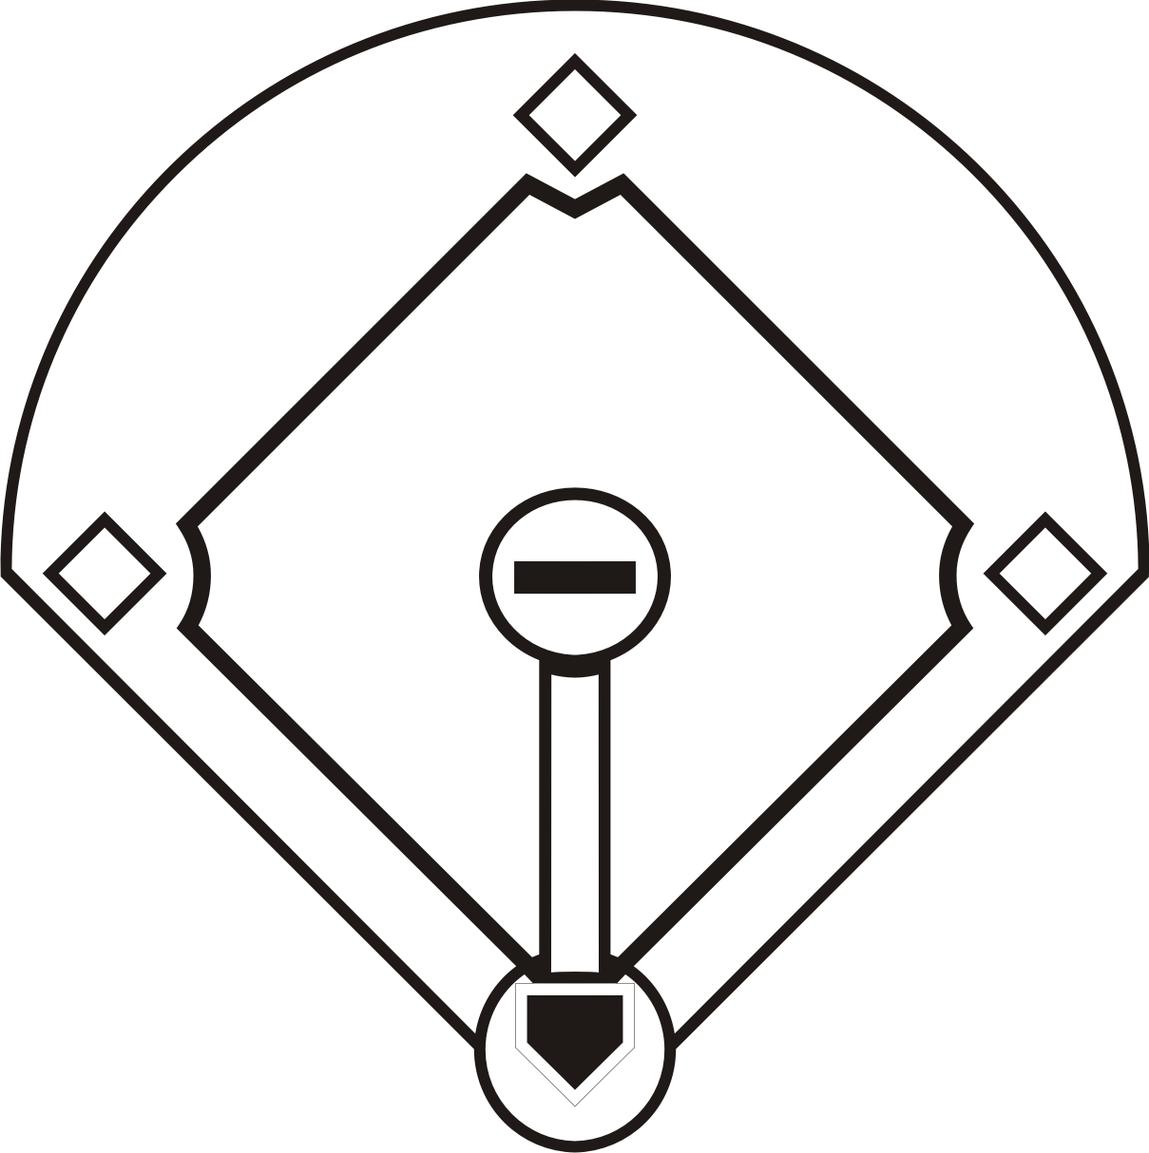 Baseball field clip art images.